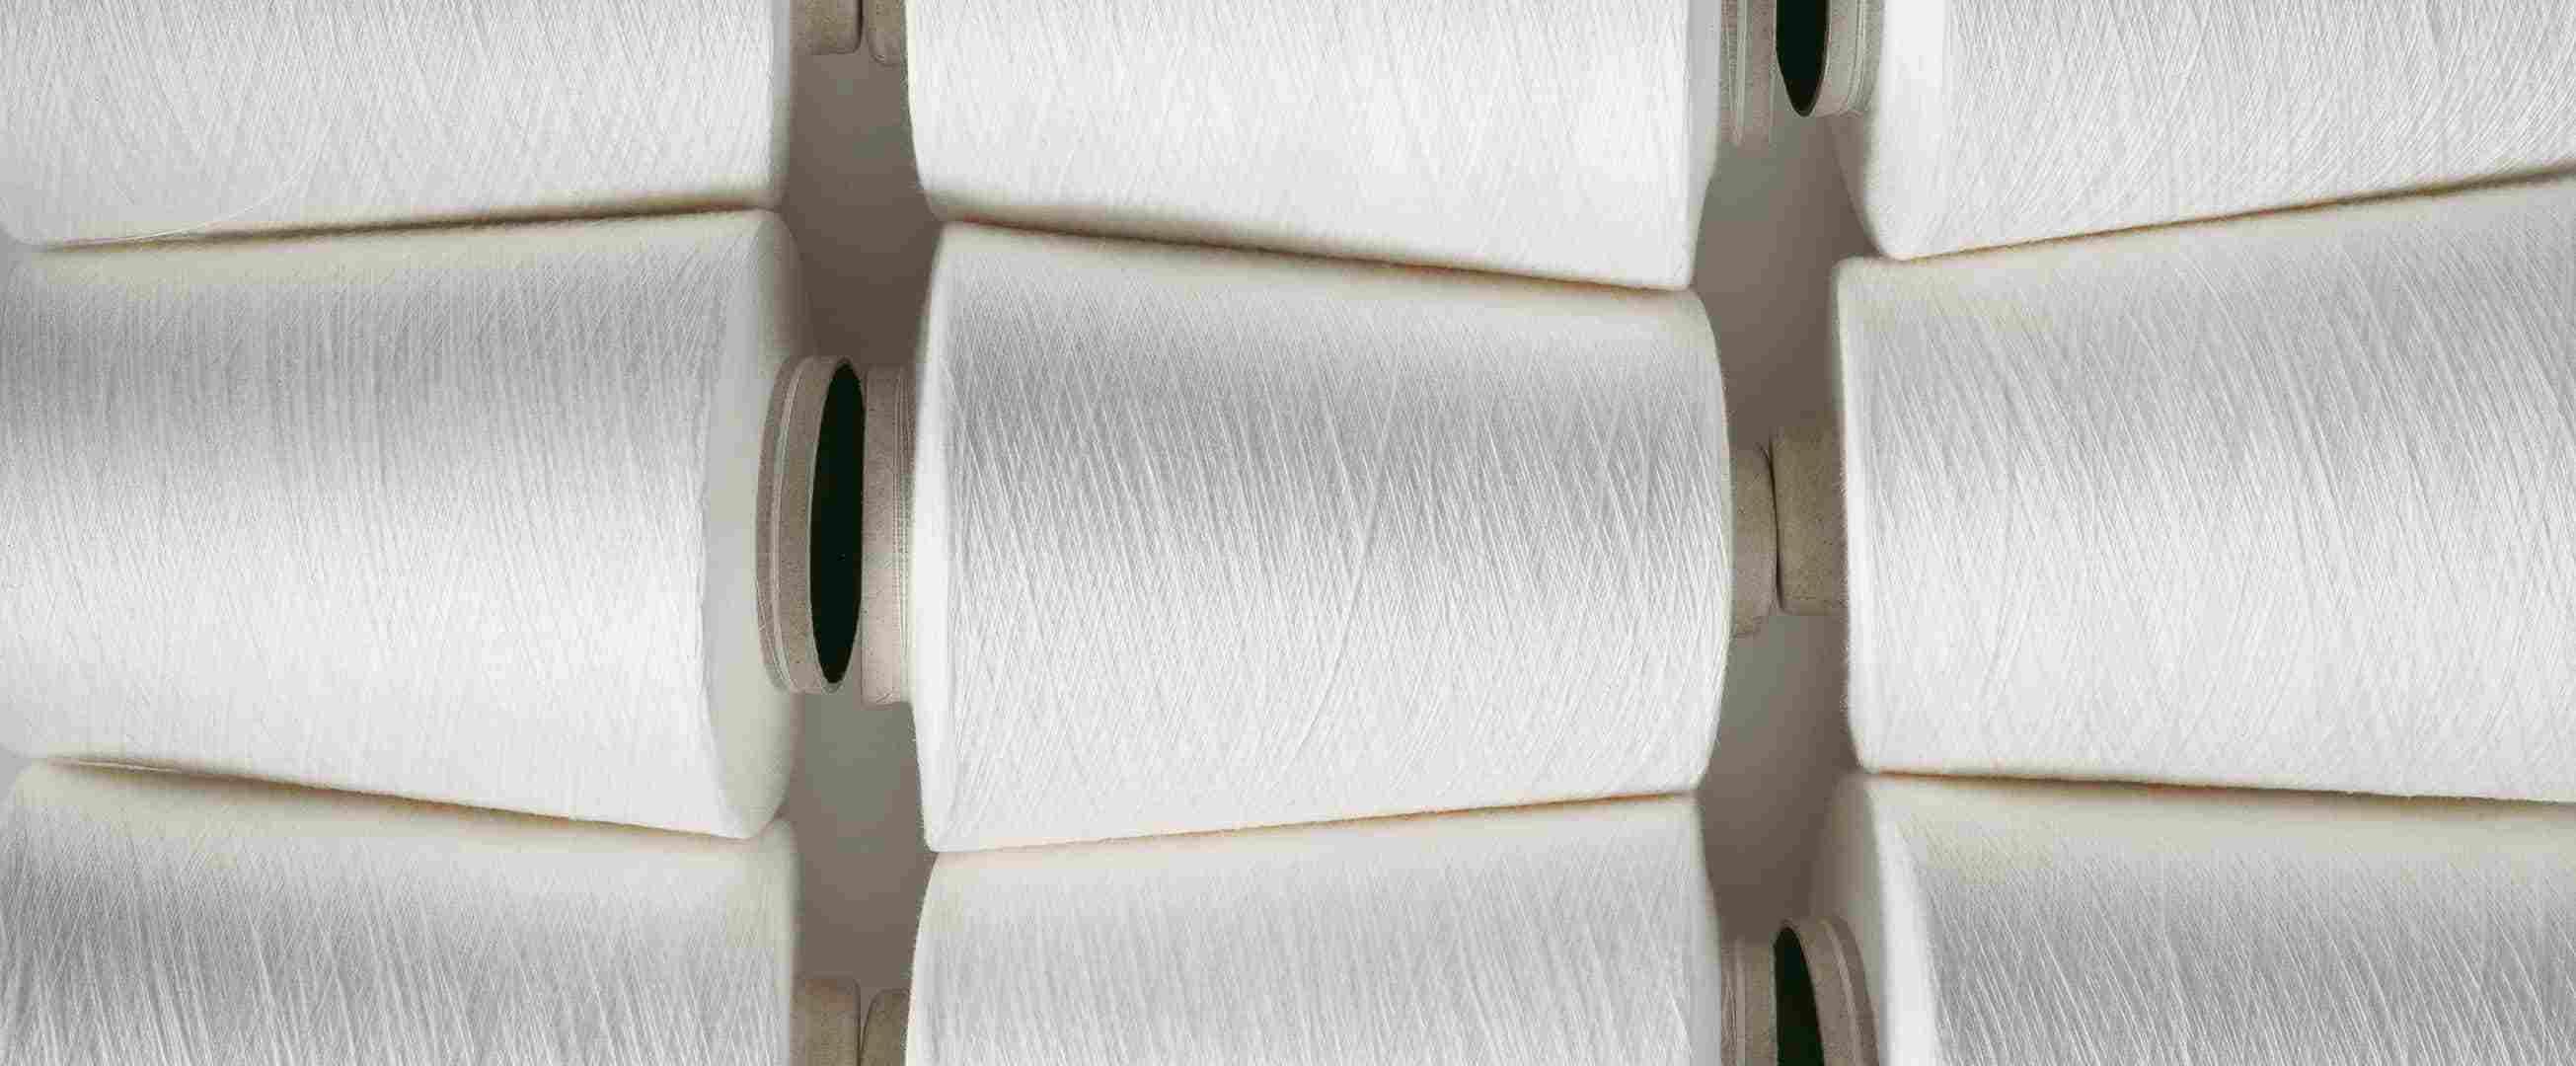 Lyocell & Modal Yarn - TENCEL Sustainability Botanic Origin